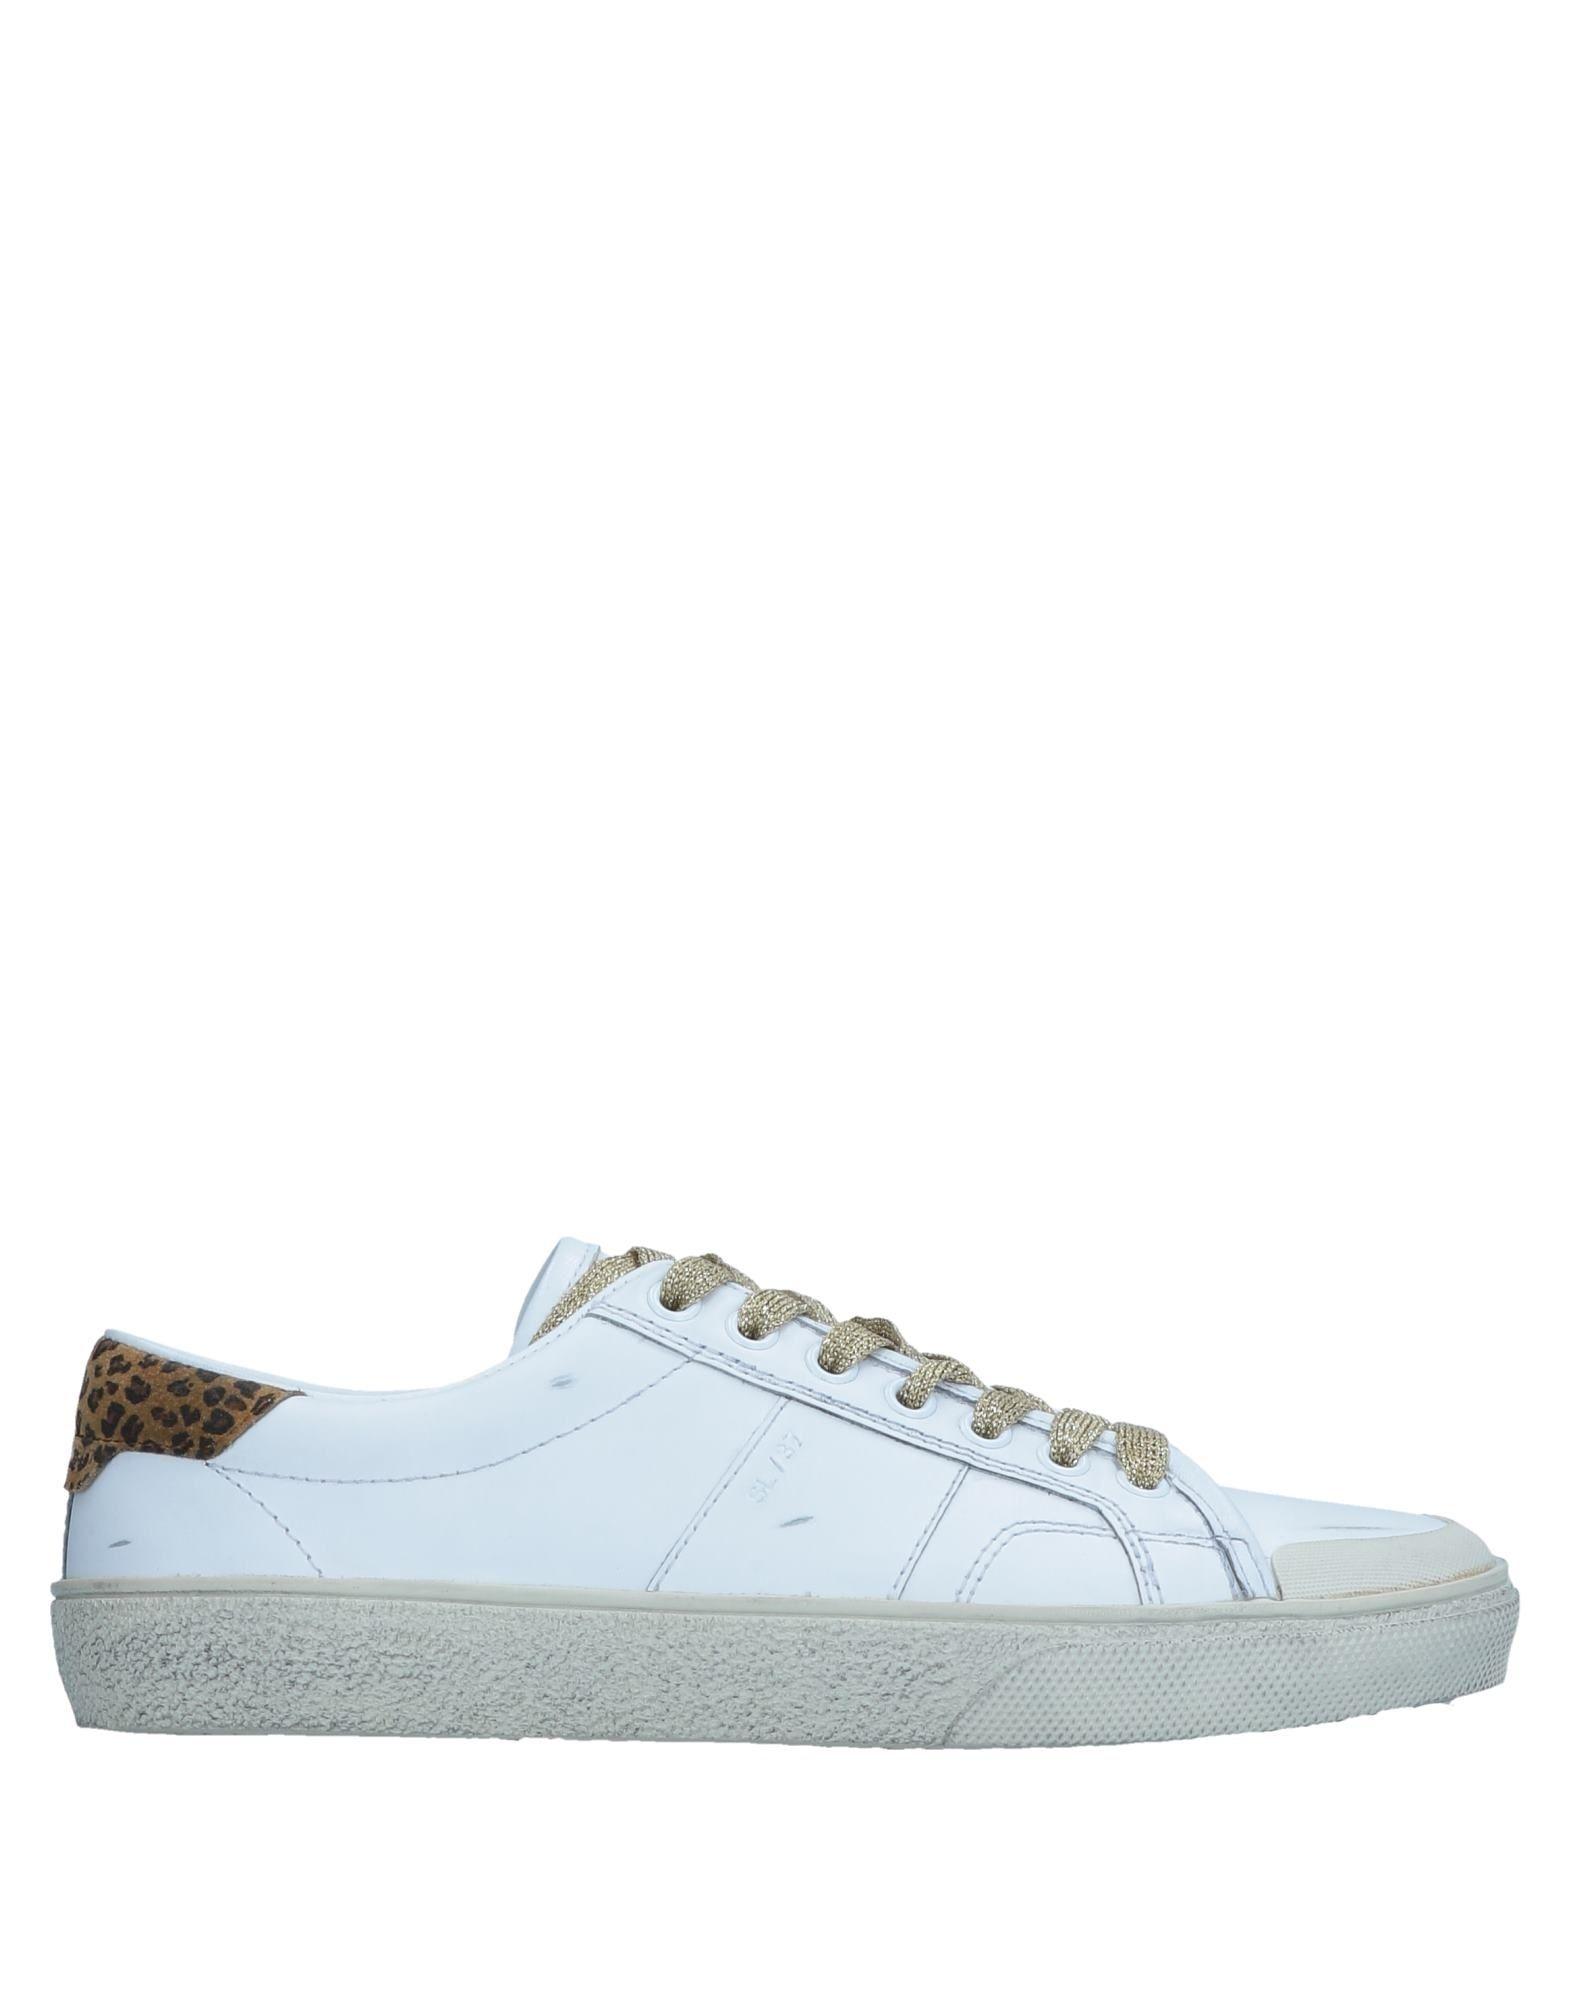 Rabatt Schuhe Saint Laurent Sneakers Damen  11558047VC